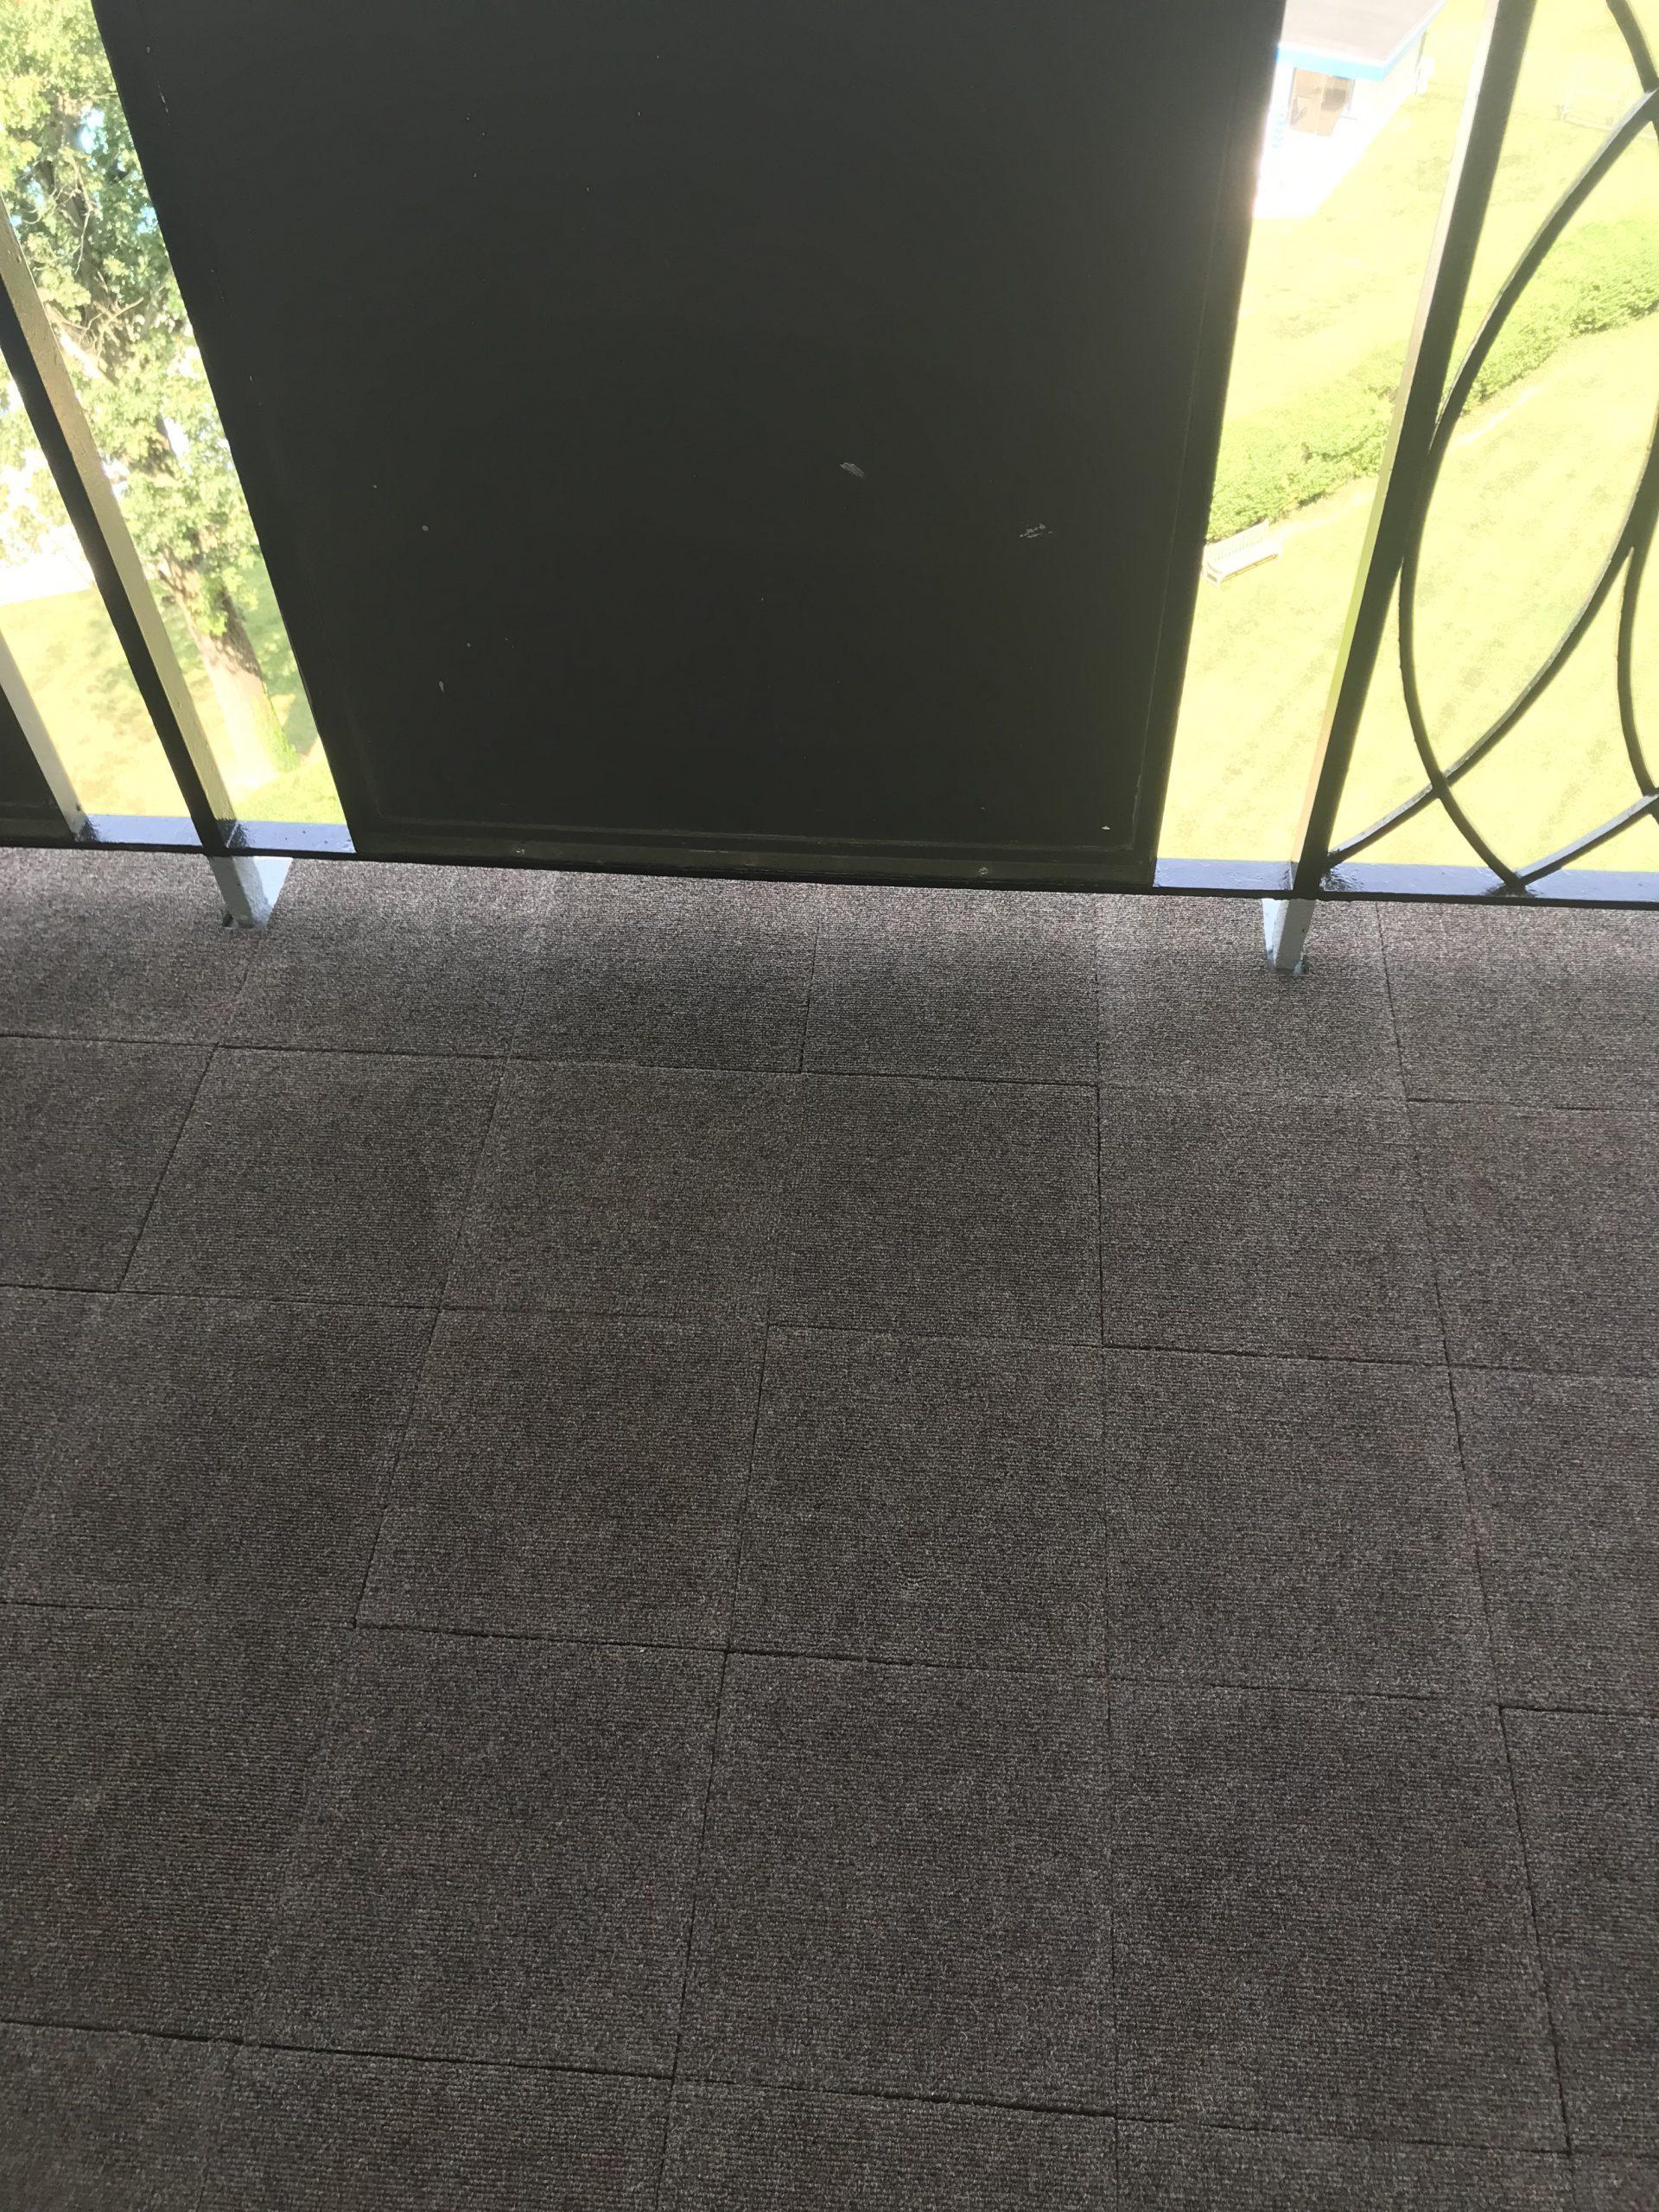 Autumn Woods Carpet Tile Install 1